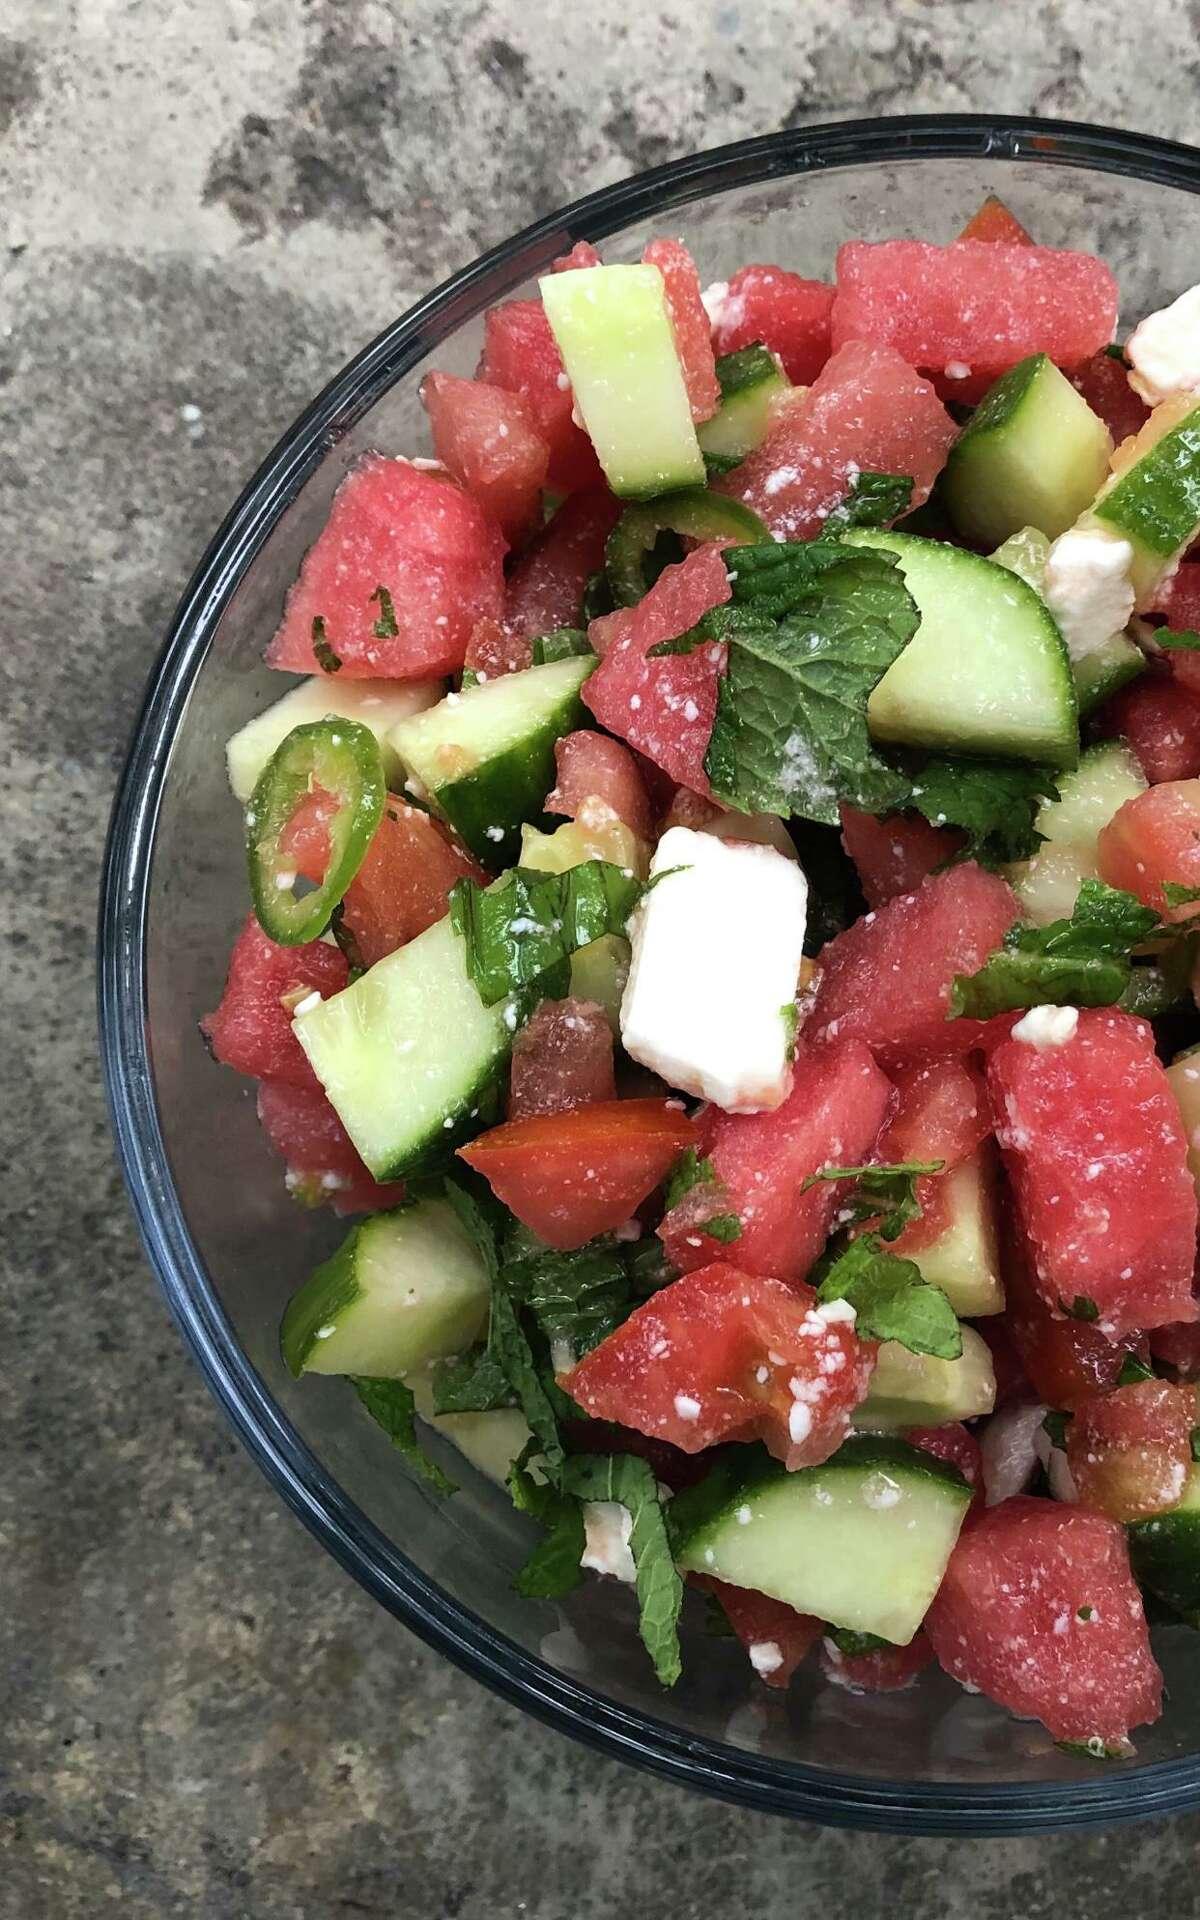 Watermelon, cucumber, tomato, feta, basil, mint, serrano and citrus make this summer salad sing.